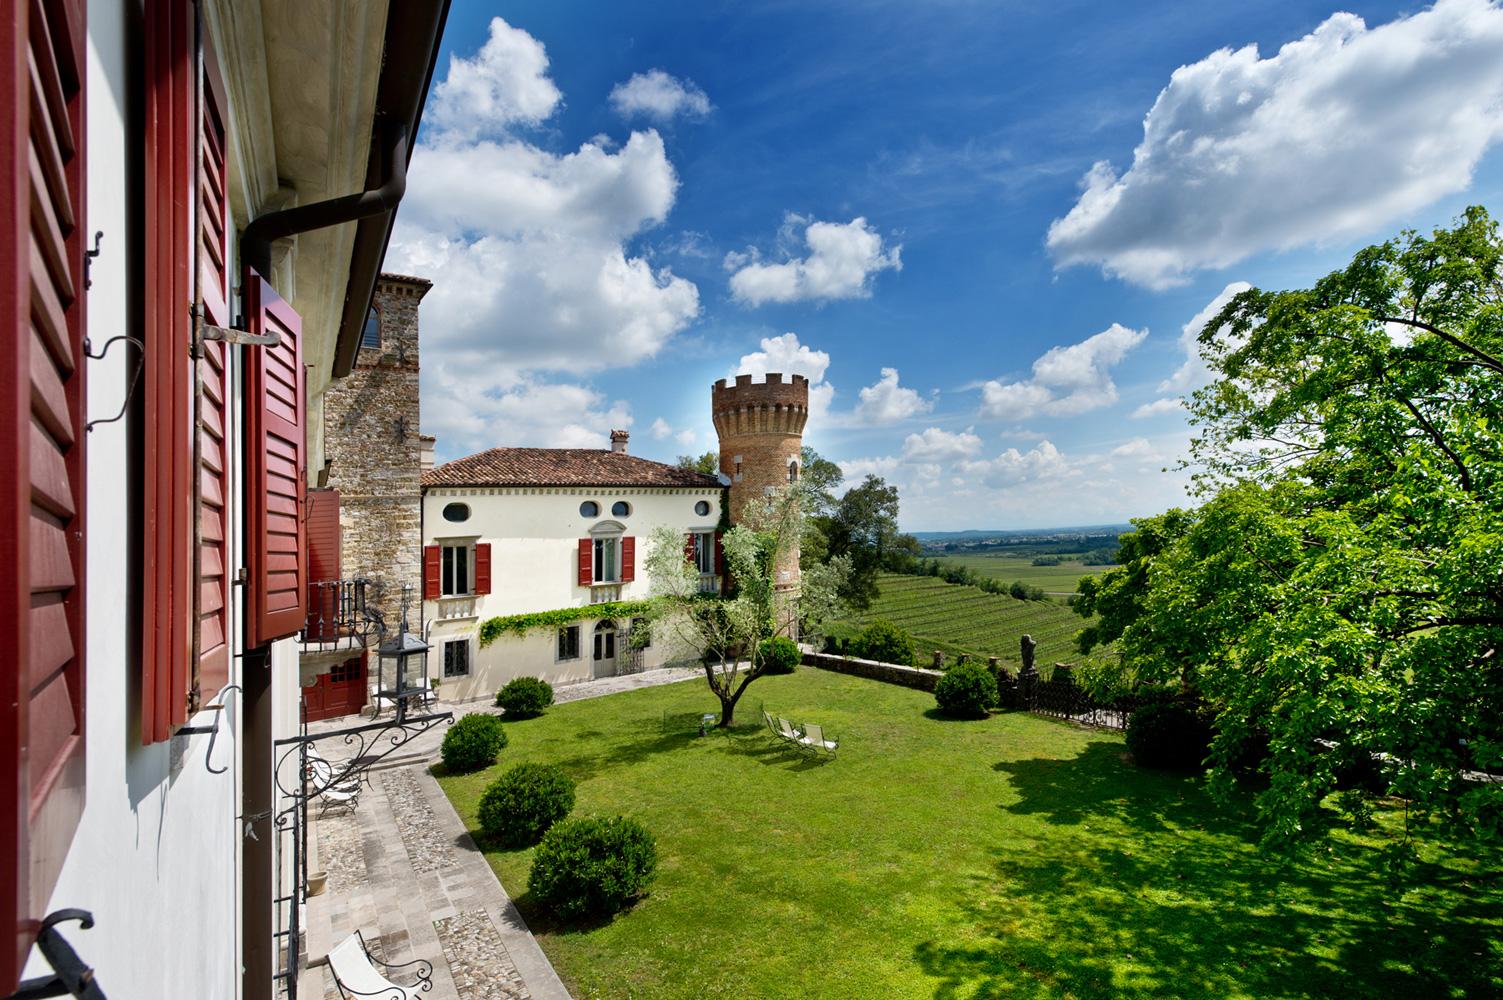 Castello di Buttrio bei Udine im Friaul.